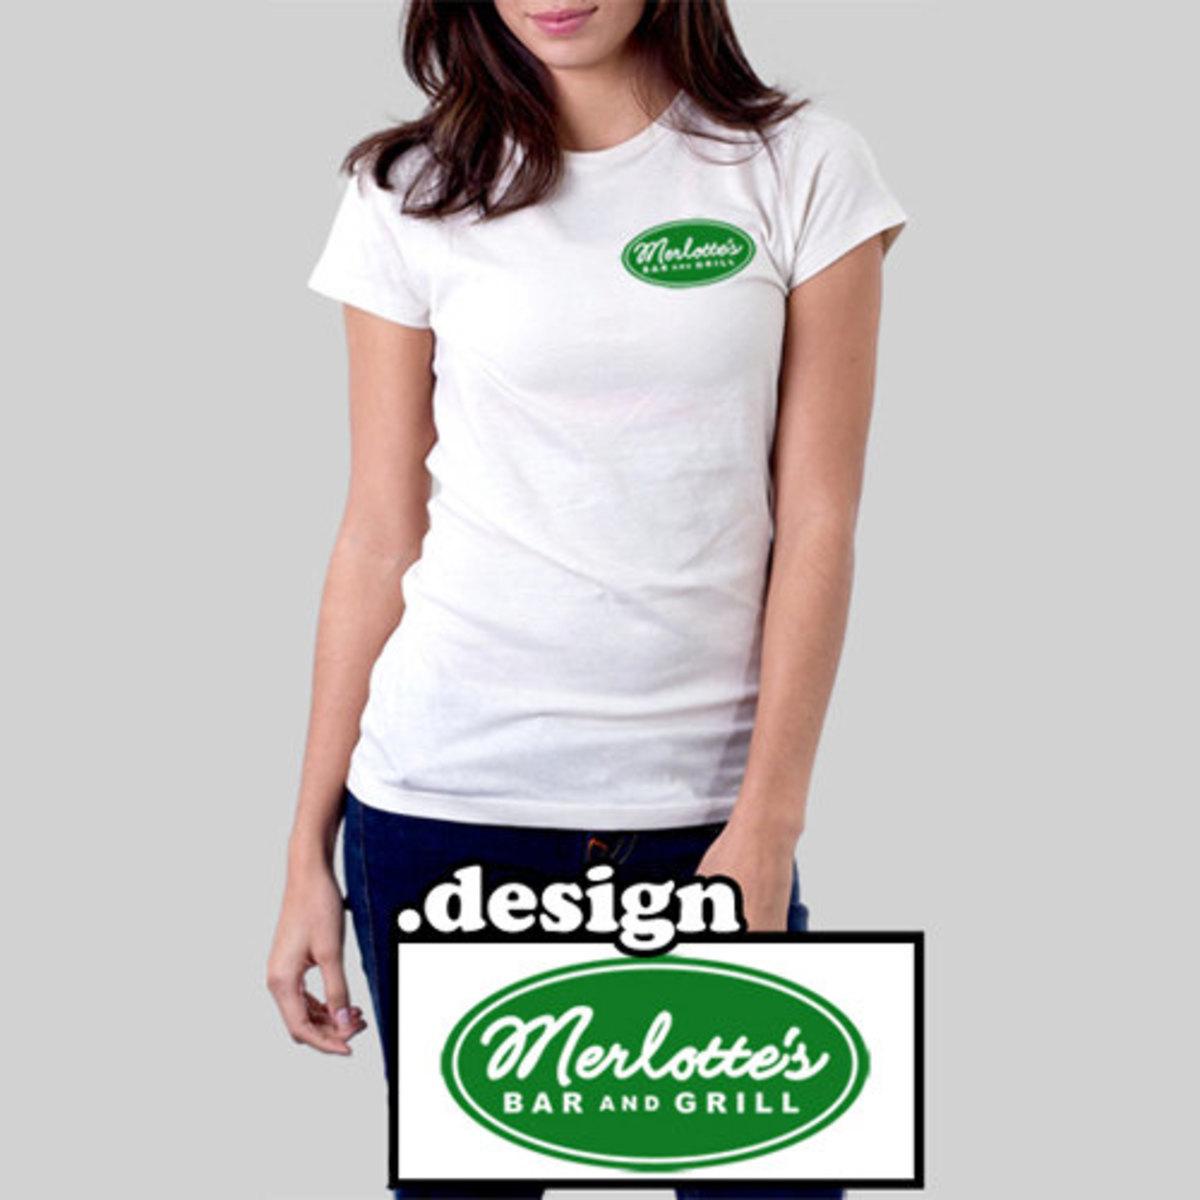 Merlotte's Tshirt on etsy.com for less than $15